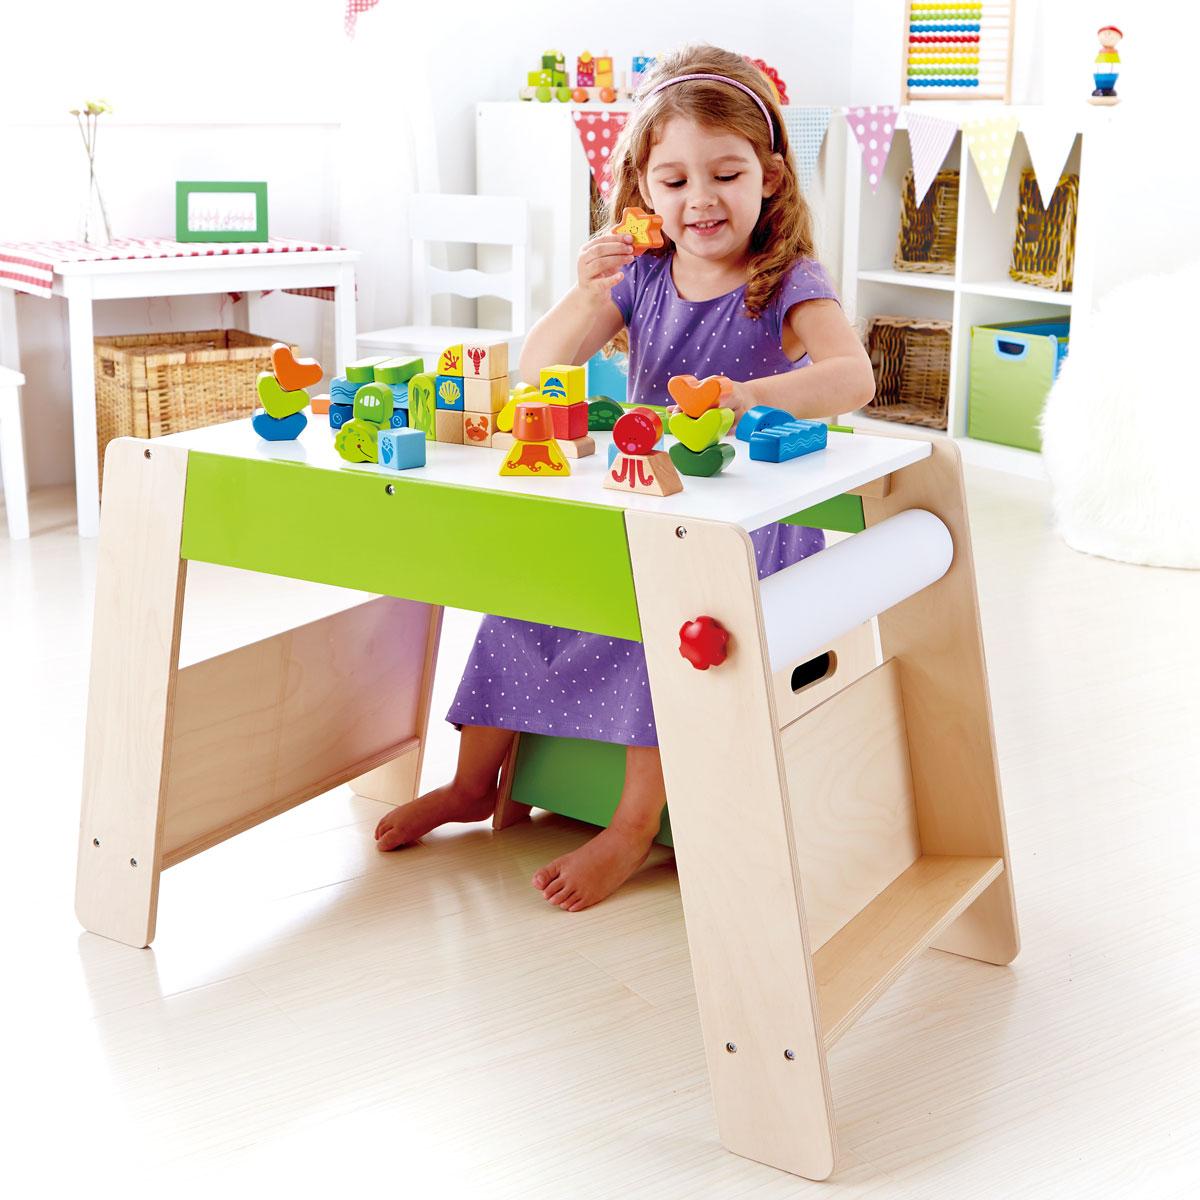 Hape Erste Sitzgruppe E1015 | Pirum-Holzspielzeuge.de